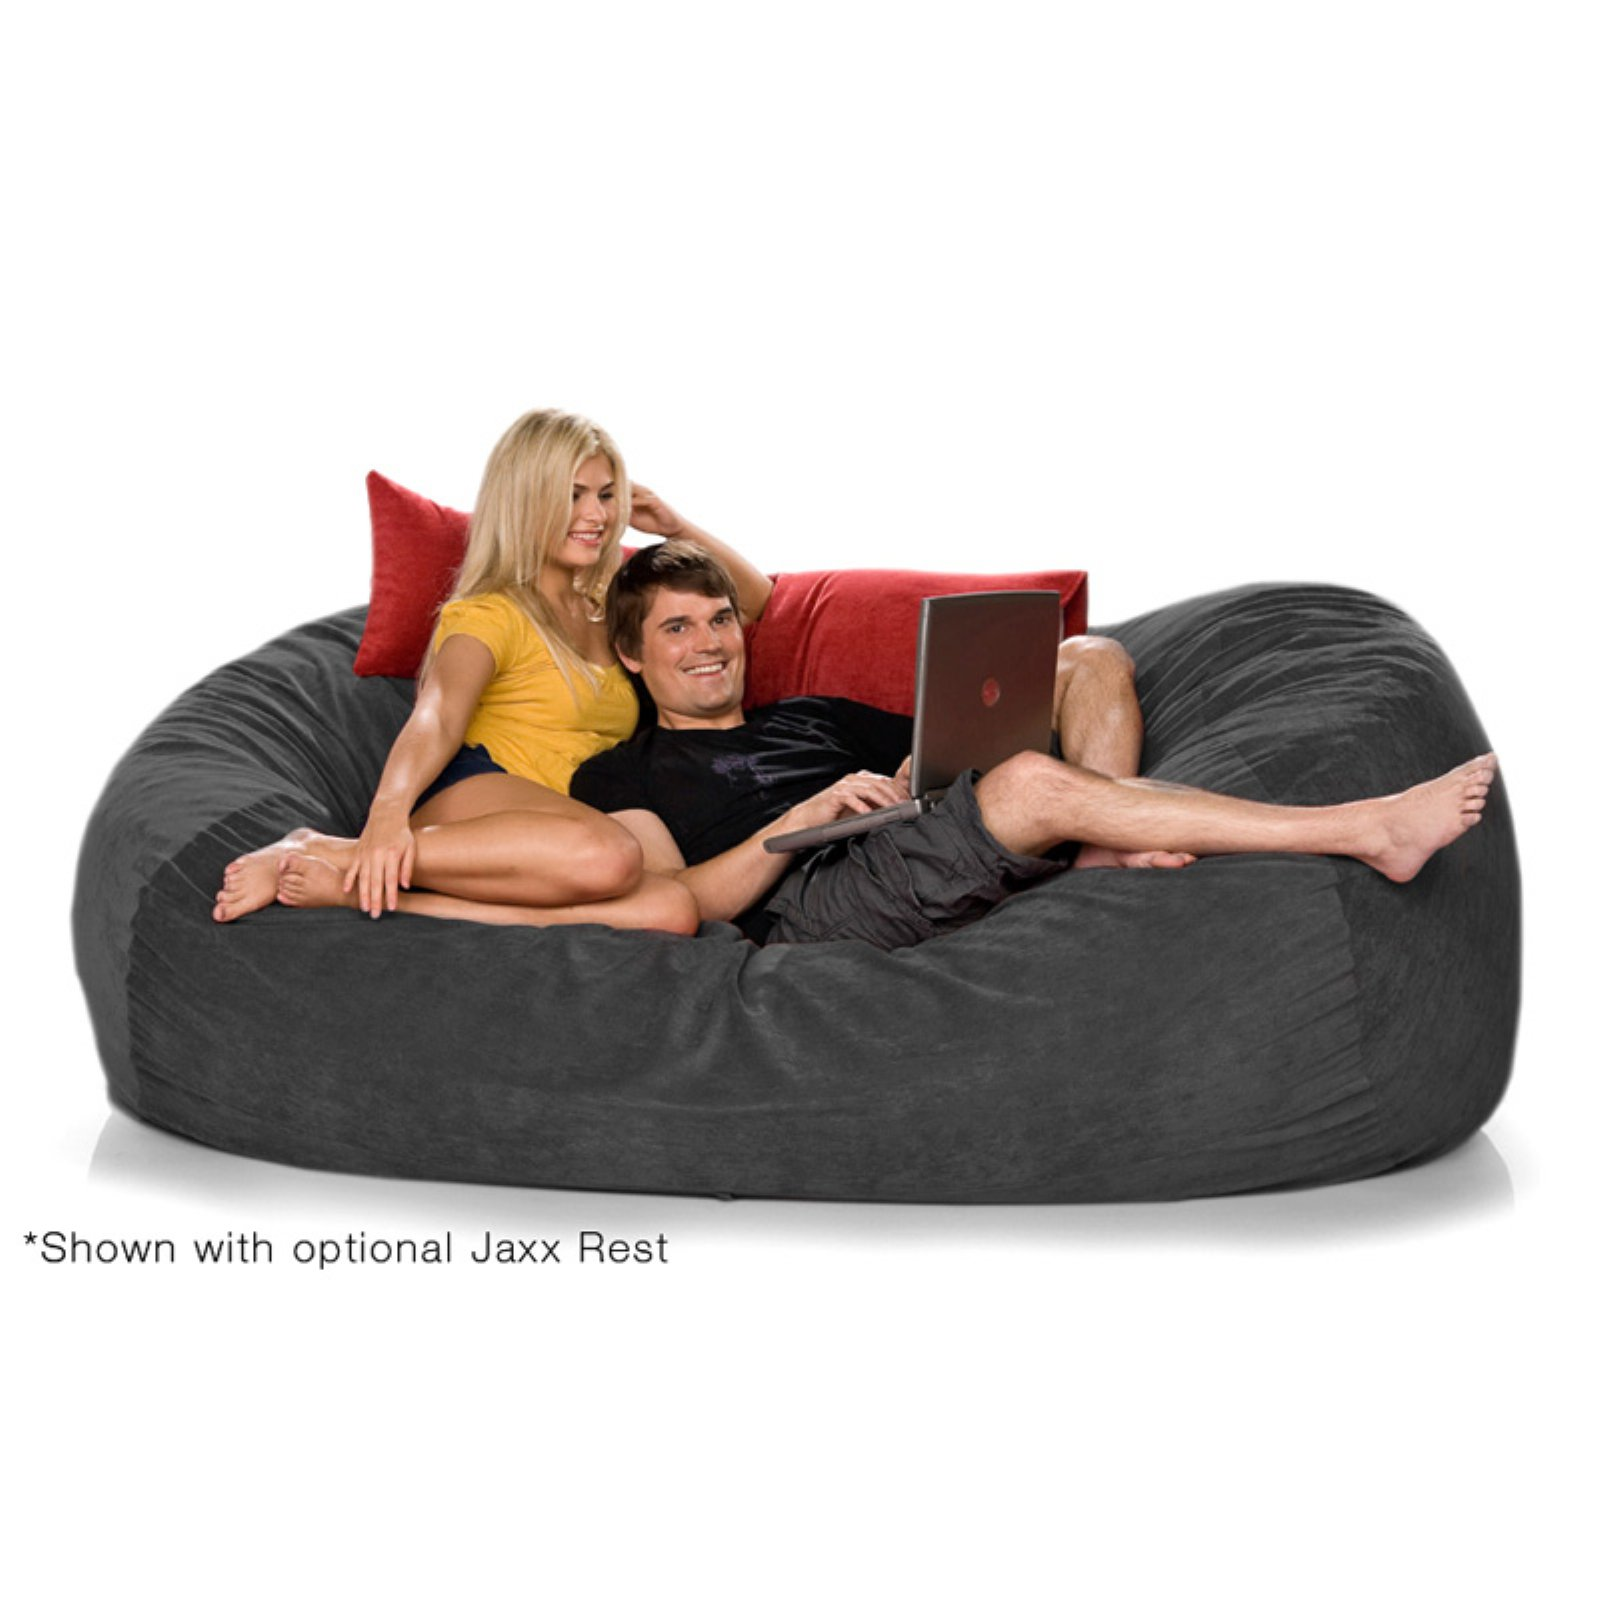 Jaxx 7.5 ft Lounger Microsuede Large Foam Sofa